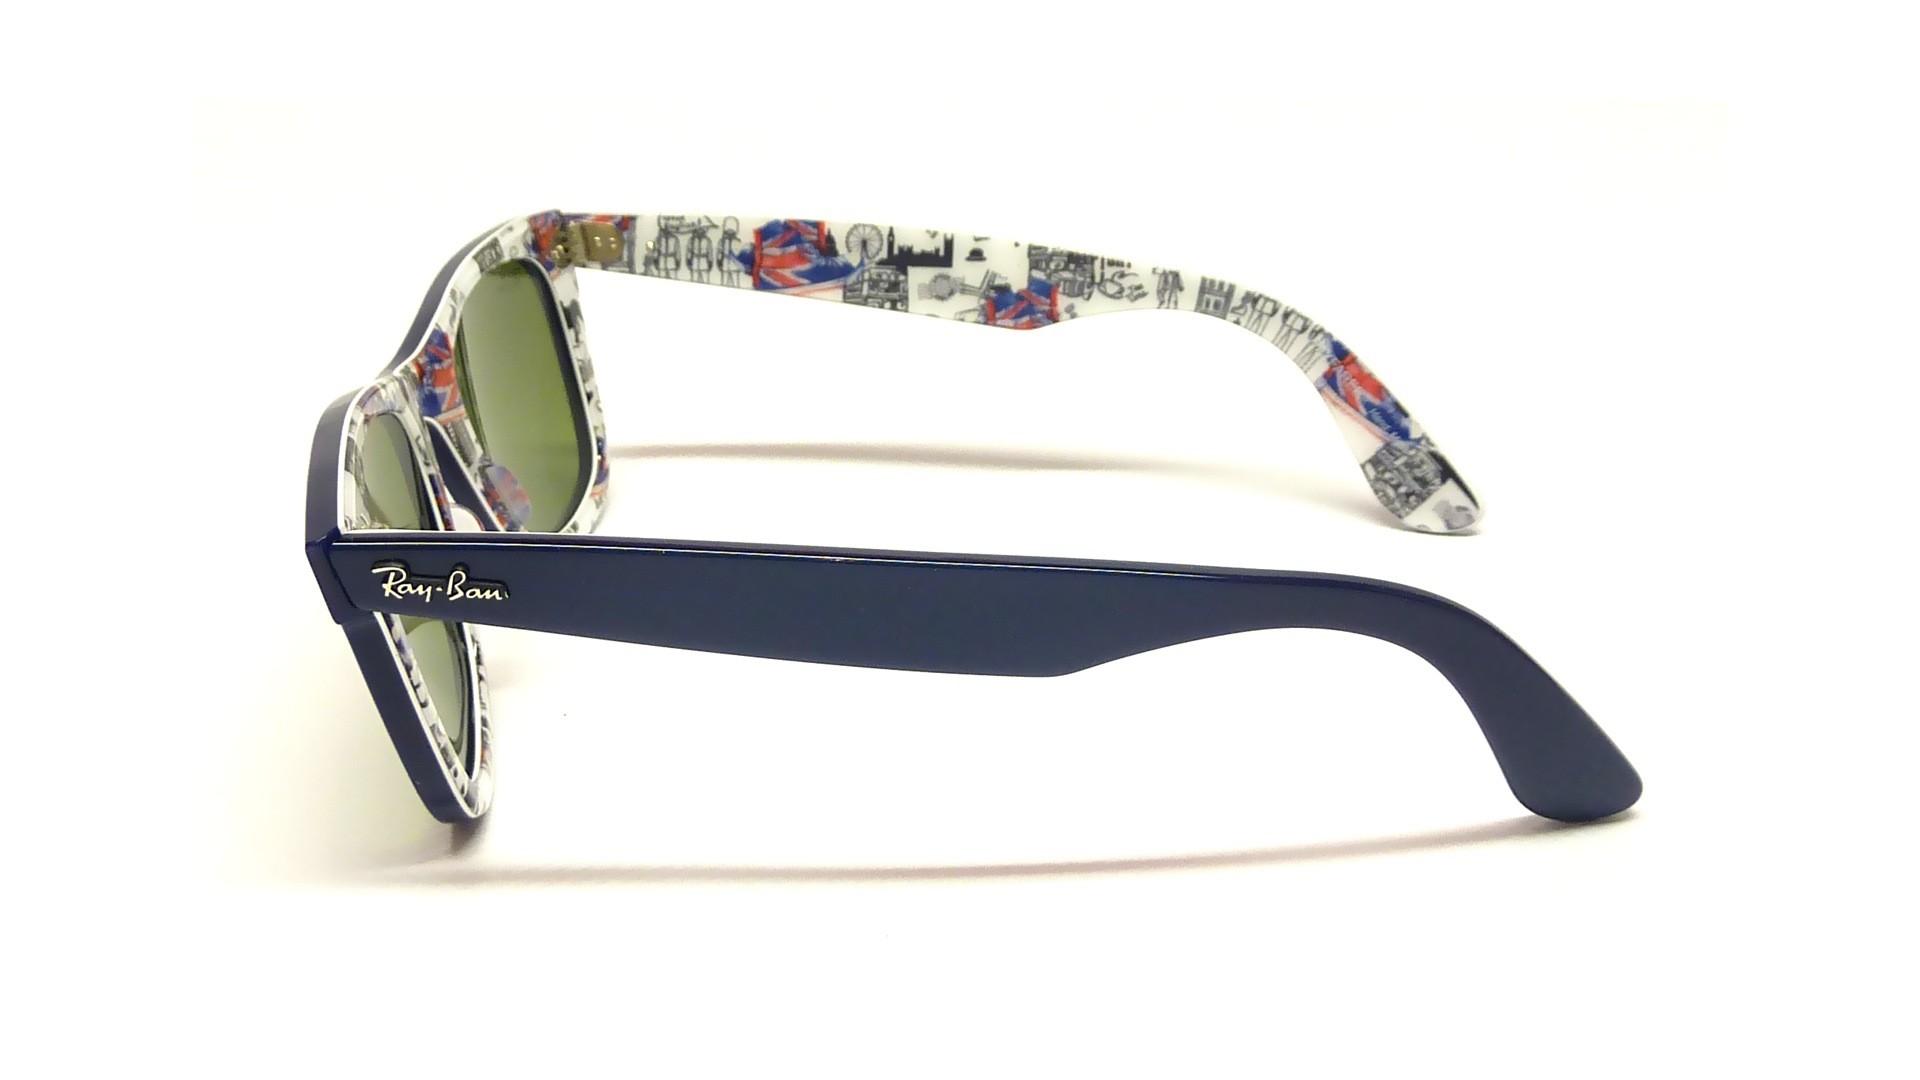 9f53d26e97 Ray Ban Sunglasses Wayfair Rb 2113 Wayfair Products « Heritage Malta